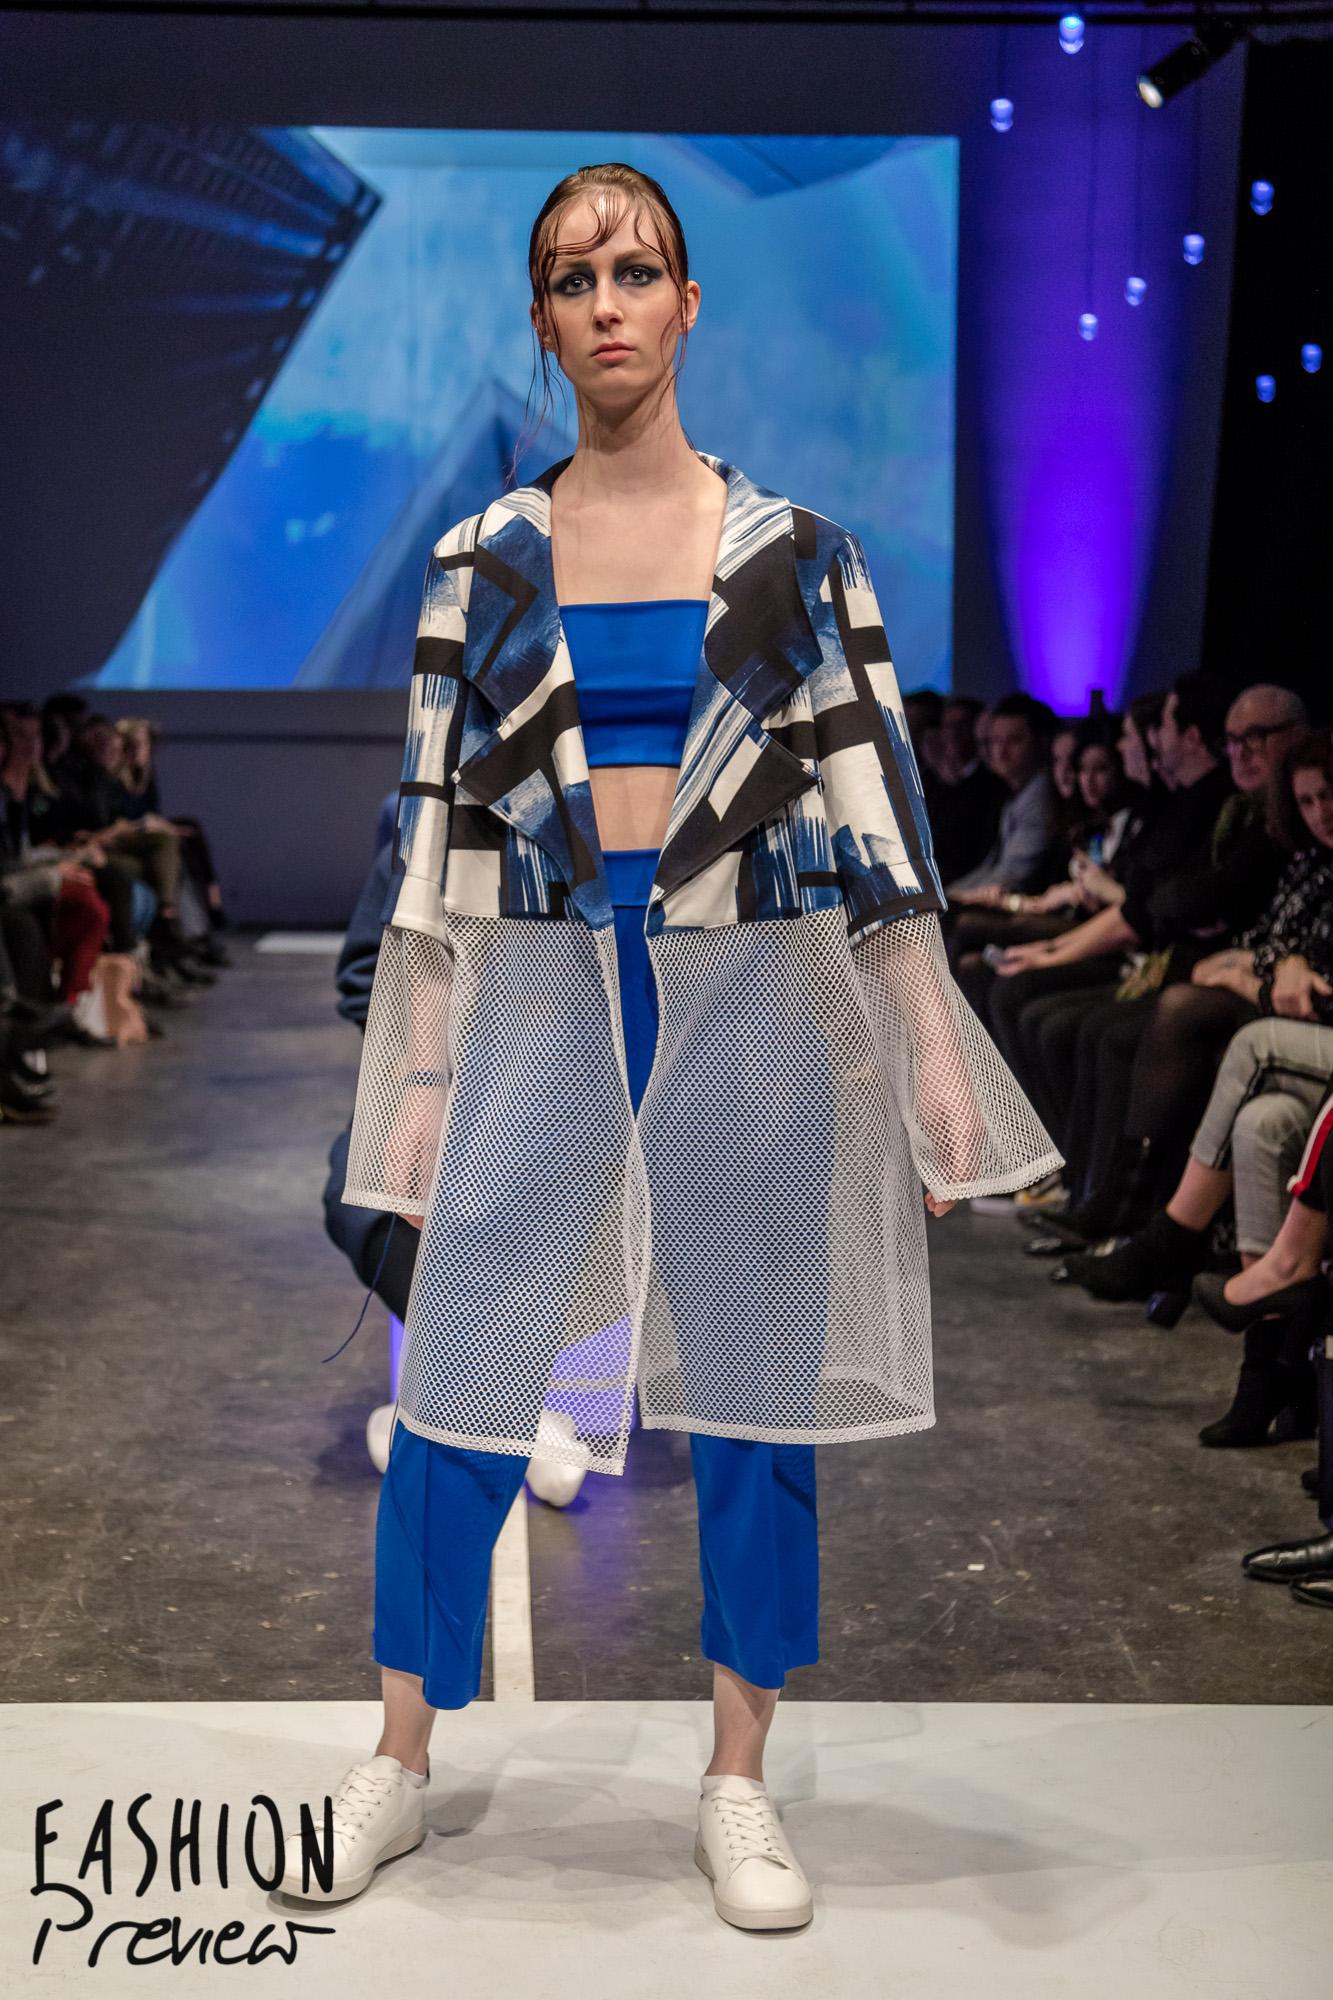 Fashion Preview 9 - Cegep Marie Victorin-08.jpg